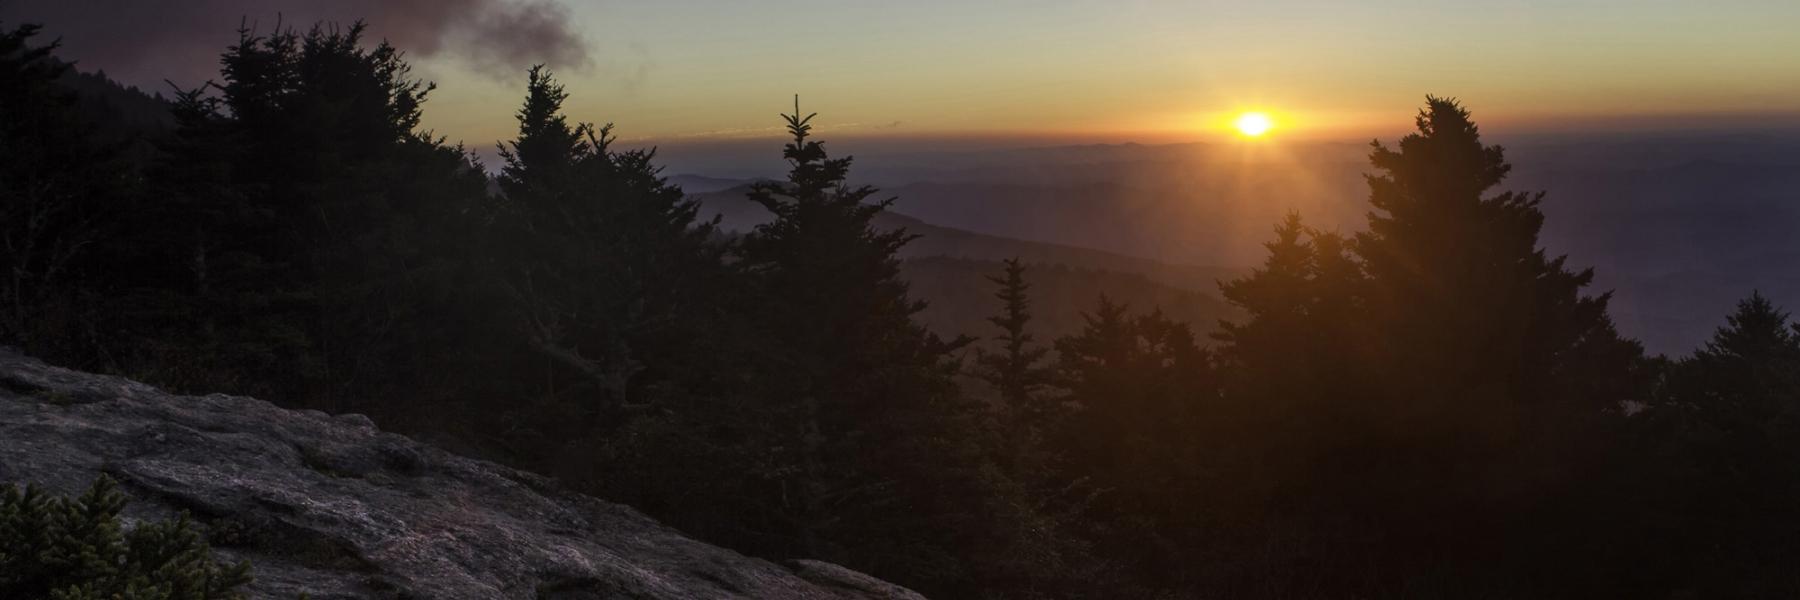 Image, Sunset